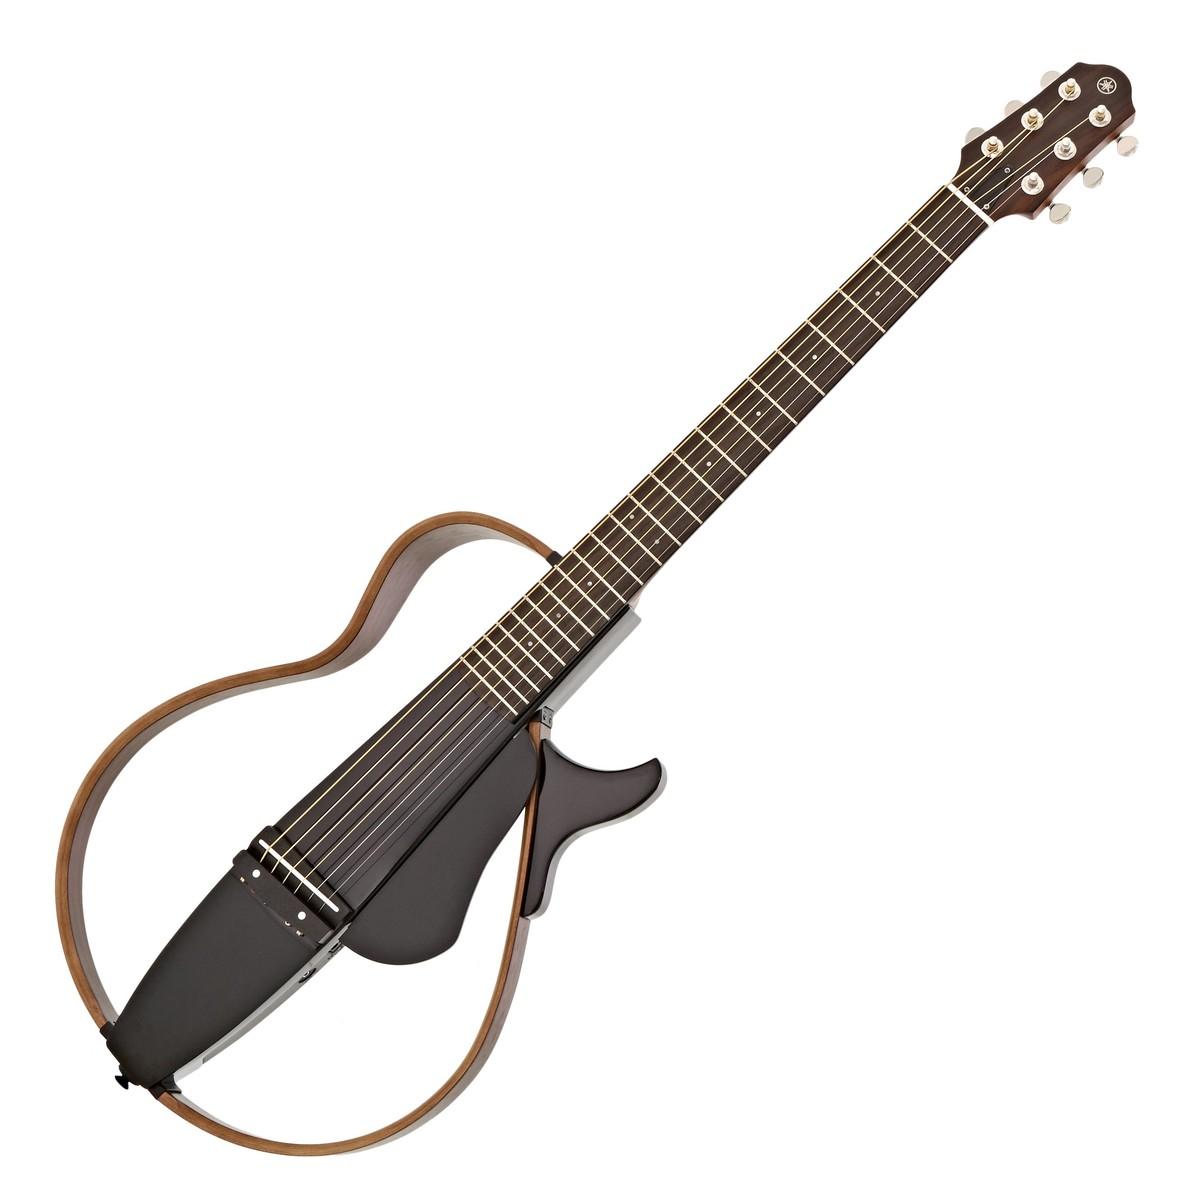 Yamaha Silent Guitar Slg200s : yamaha slg200s steel string silent guitar translucent black at gear4music ~ Vivirlamusica.com Haus und Dekorationen